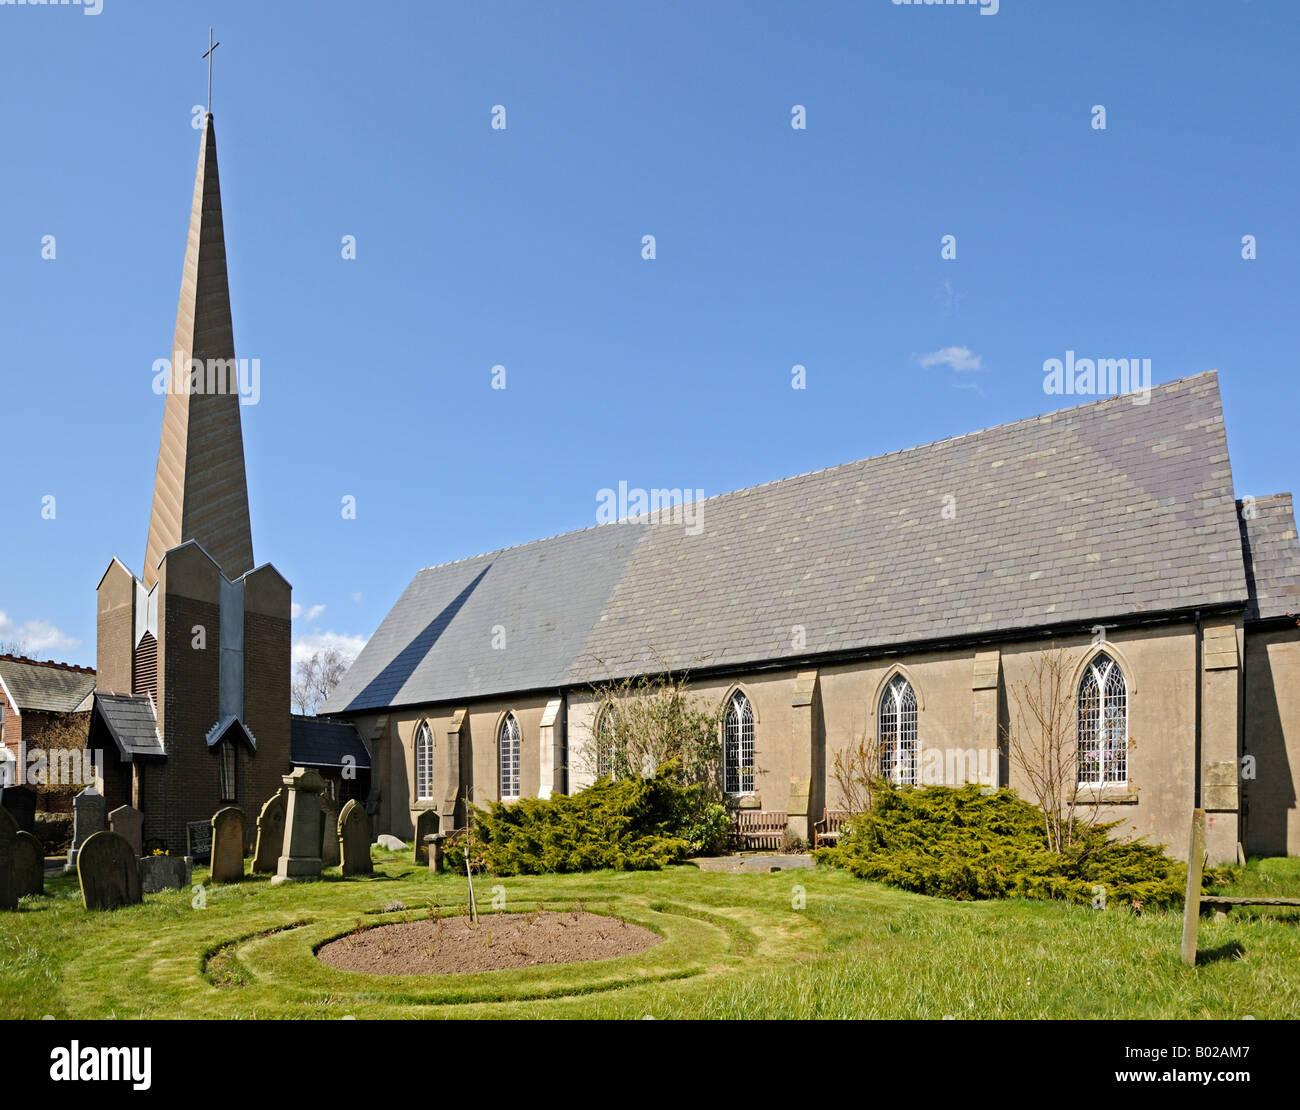 church-of-saint-mary-the-virgin-hambleton-lancashire-england-united-B02AM7.jpg